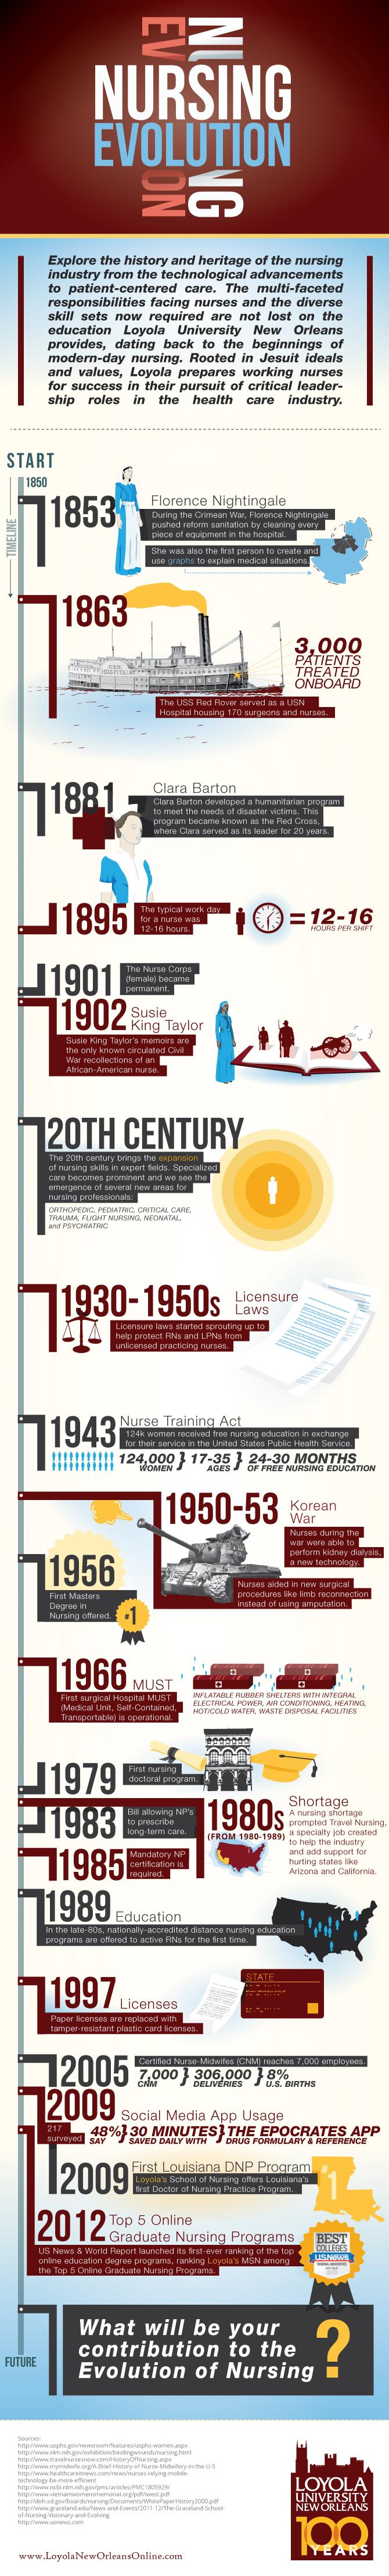 History of nursing profession